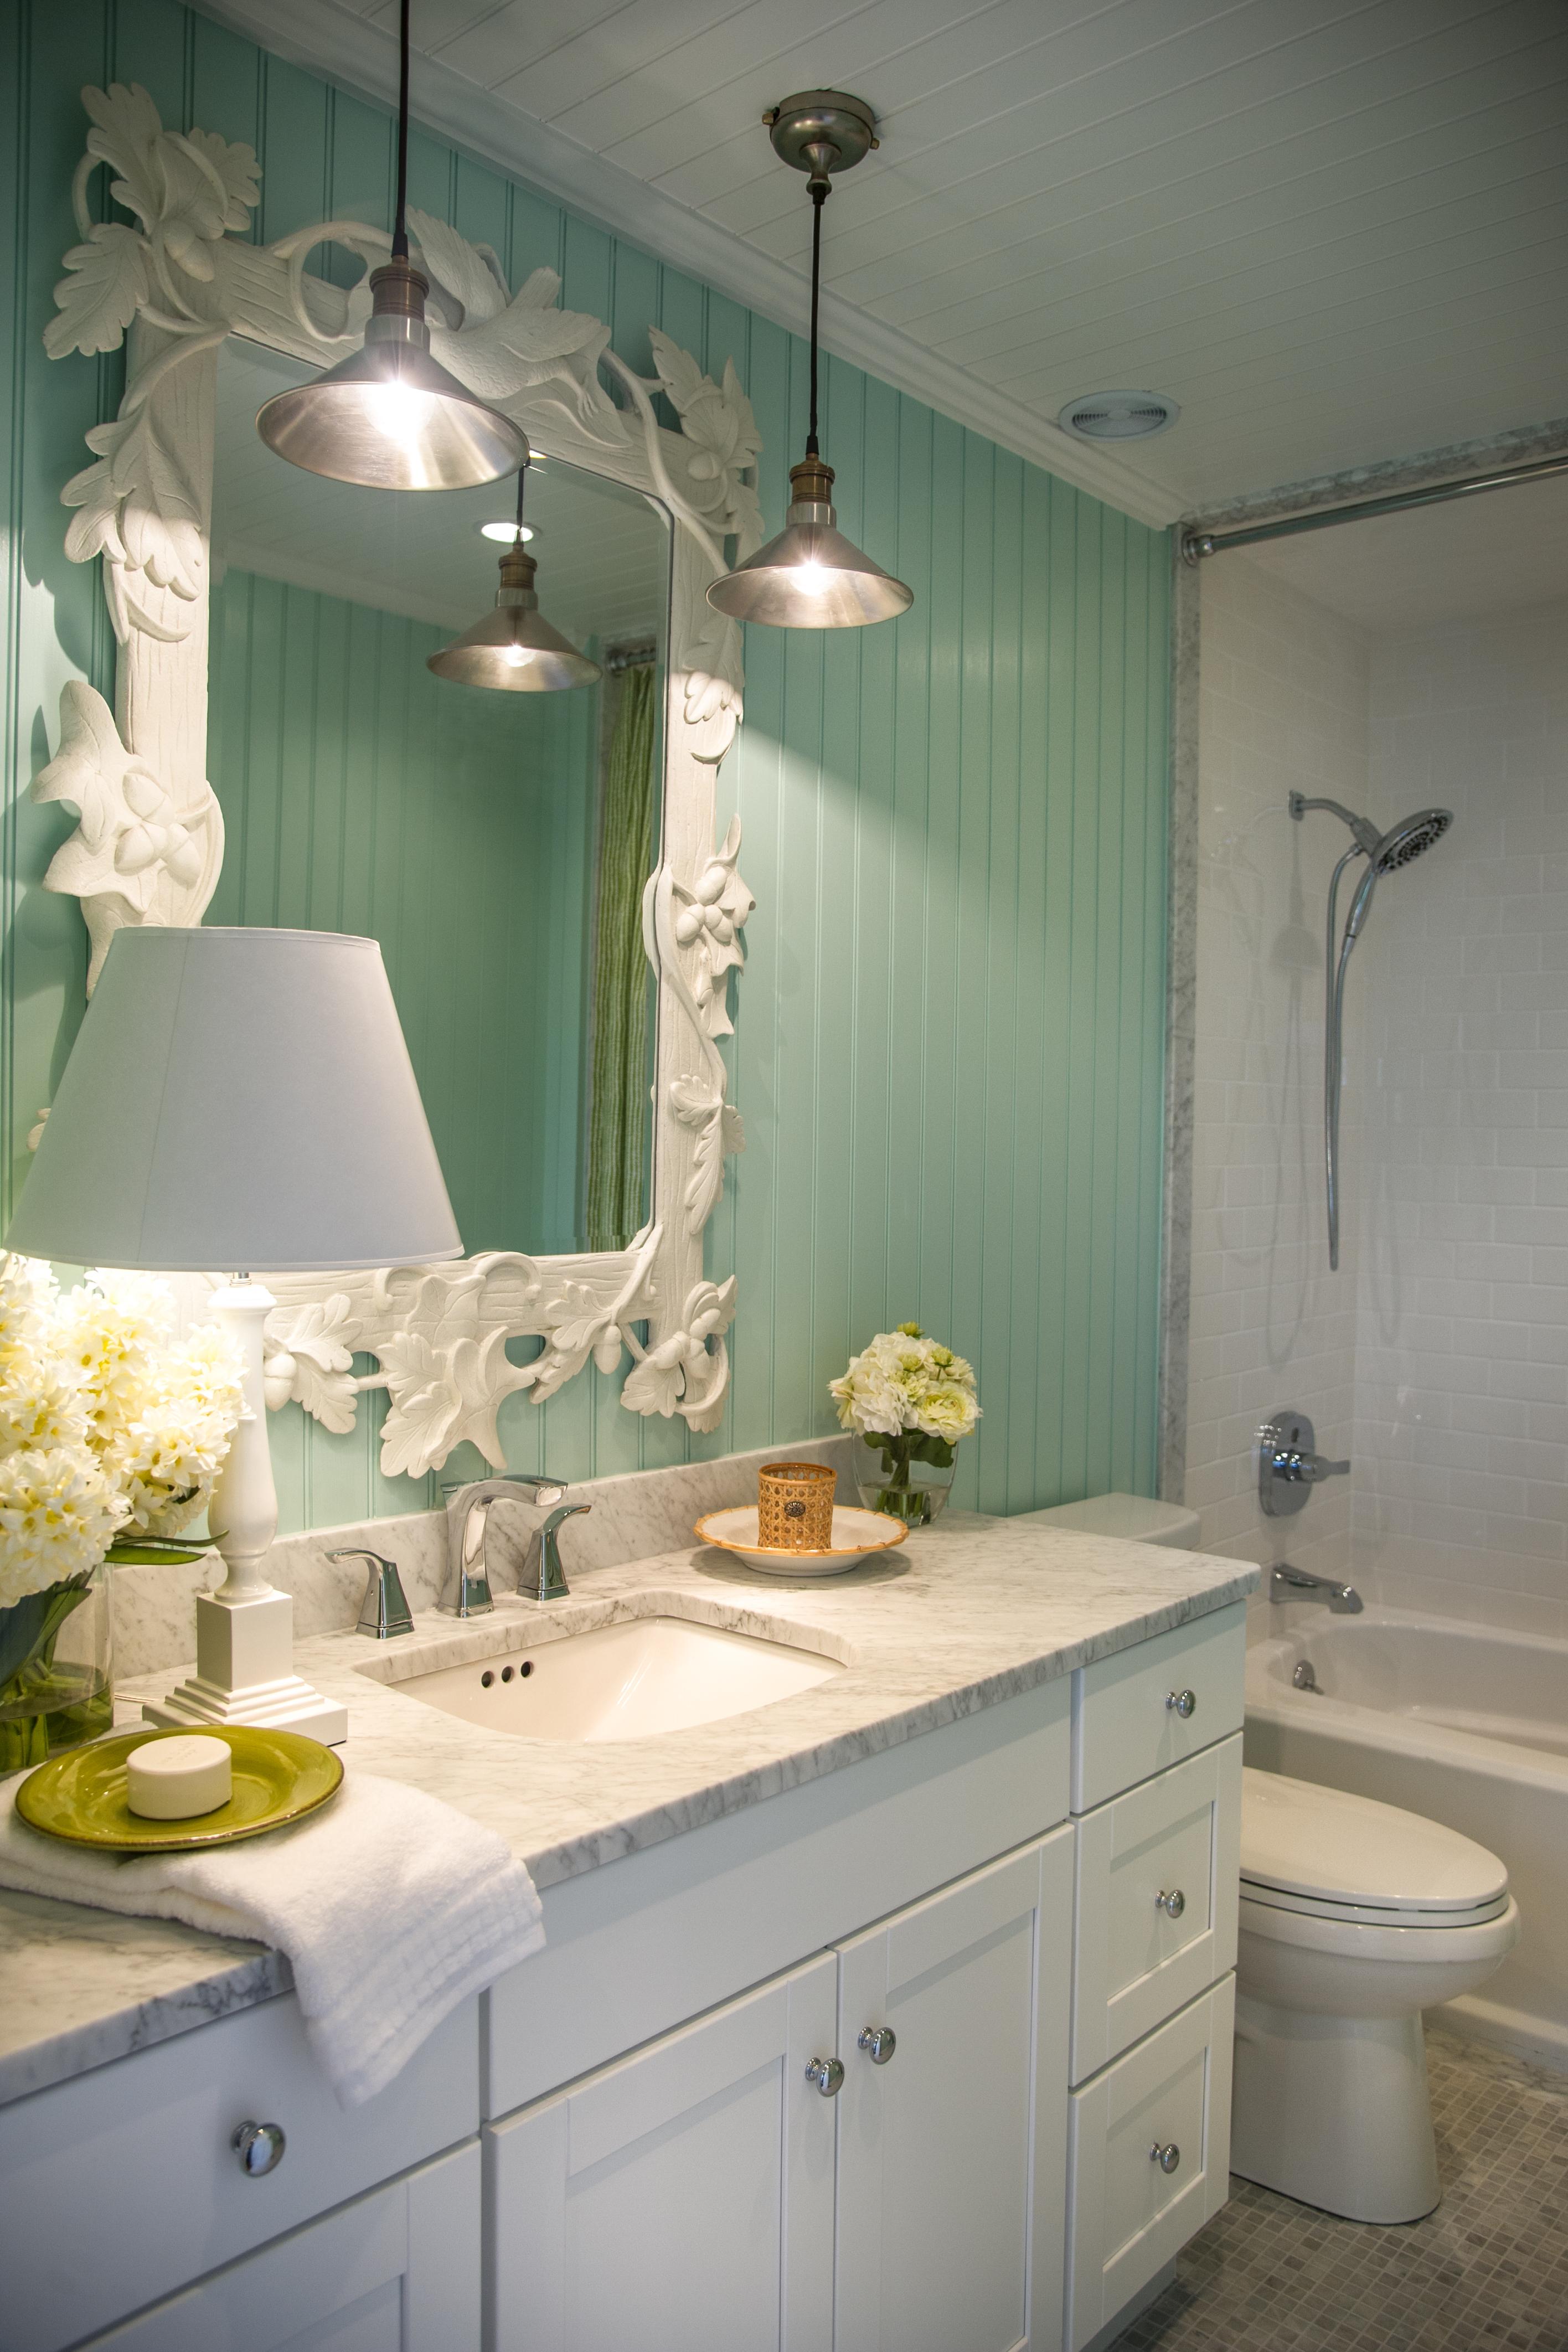 Bathroom Vanity With Minimalist Hanging Pendant Lights (View 3 of 20)